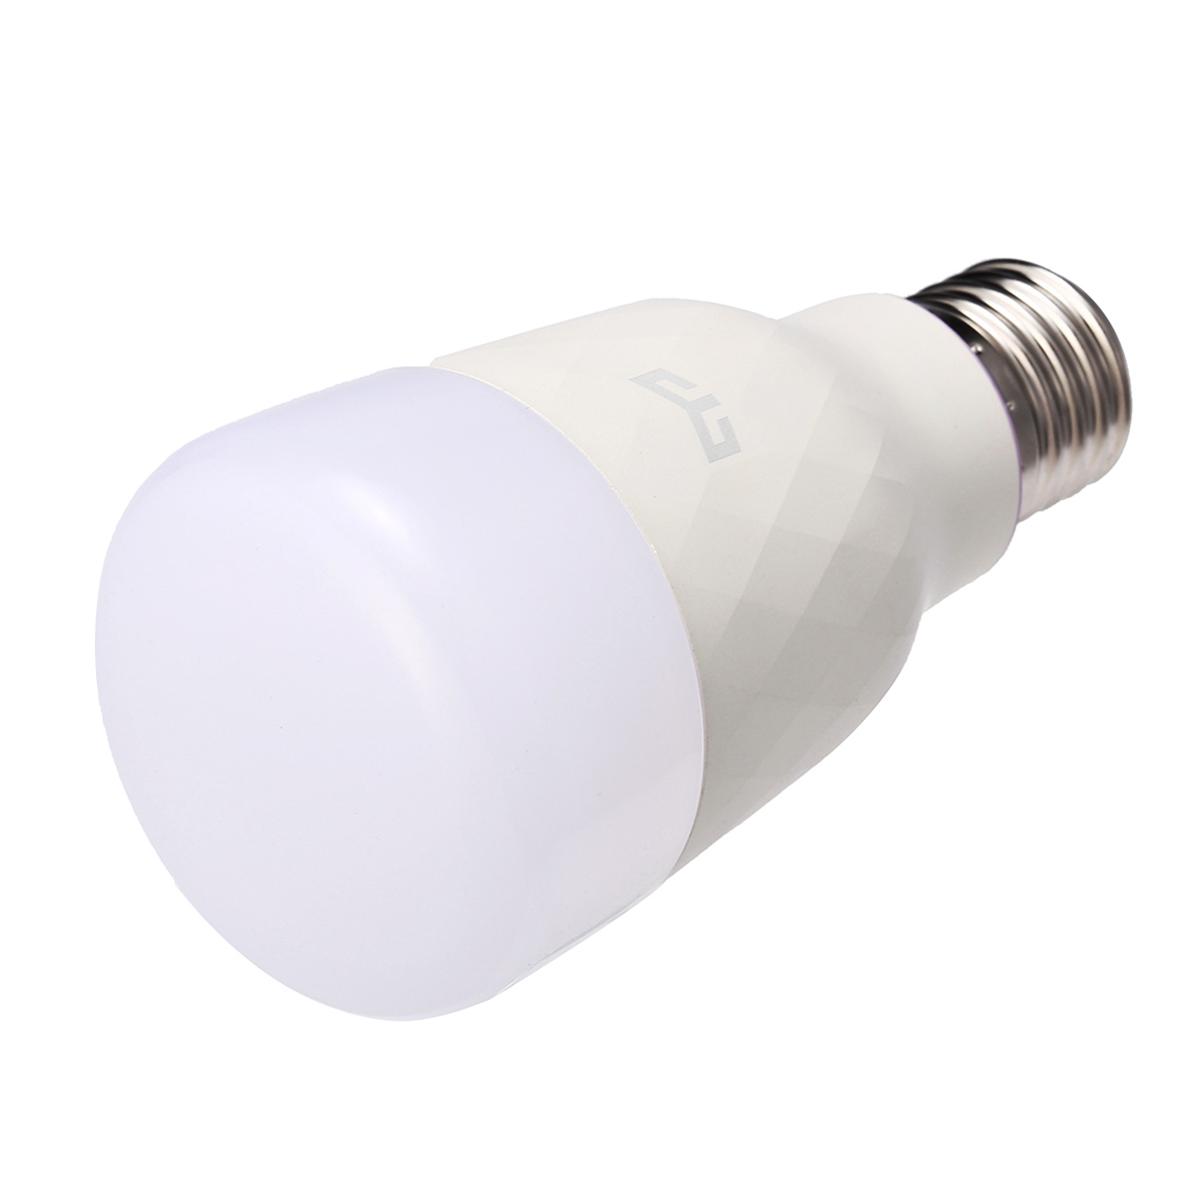 Original Xiaomi Yeelight Rgbw 10w Led Wireless Wifi Control Smart Light Bulb 34f33452 F3b4 4e9a 940d 9068ac22cde2